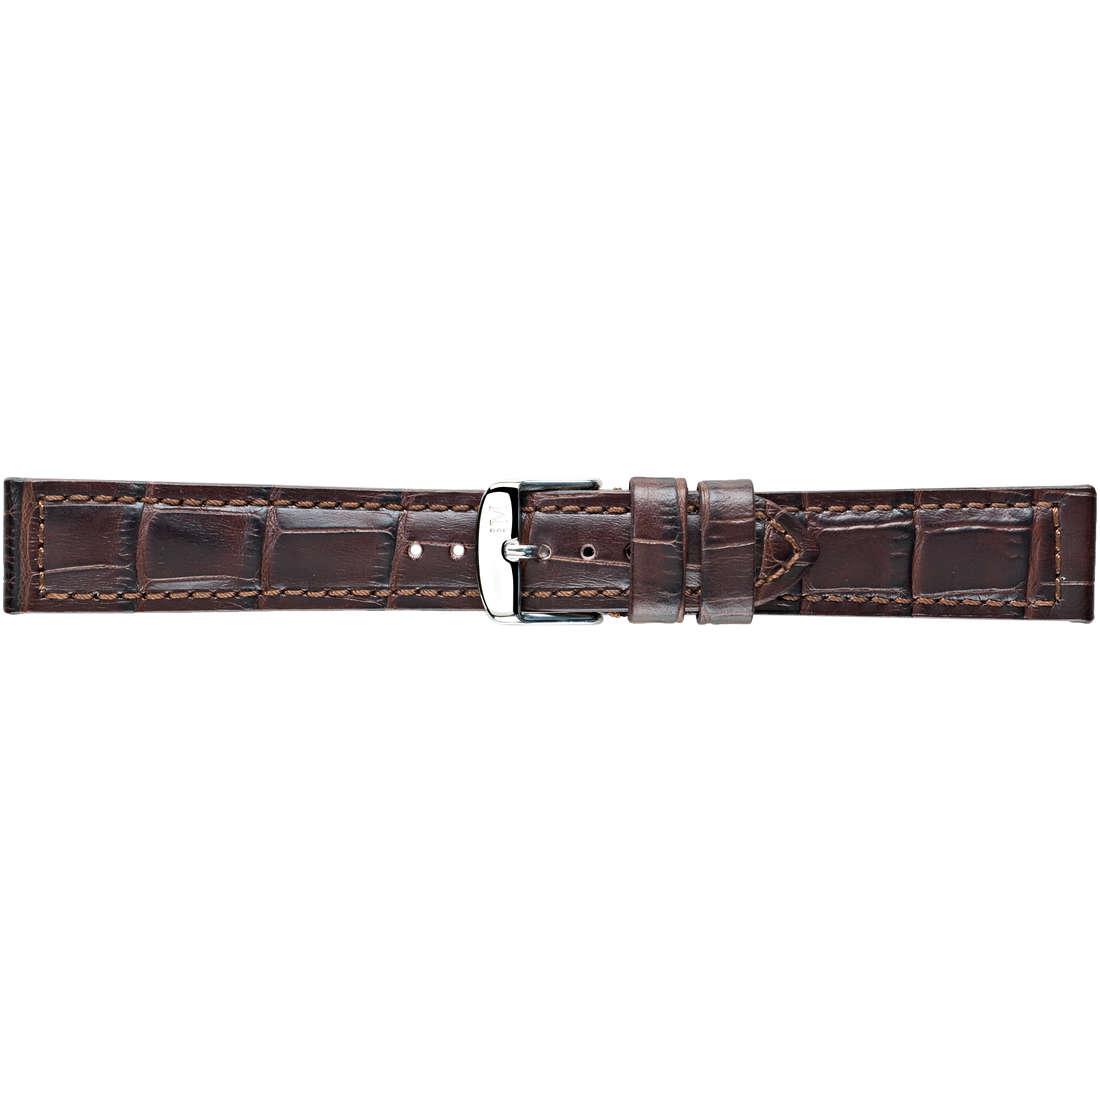 watch watch bands watch straps man Morellato Manufatti A01U2226480032CR18